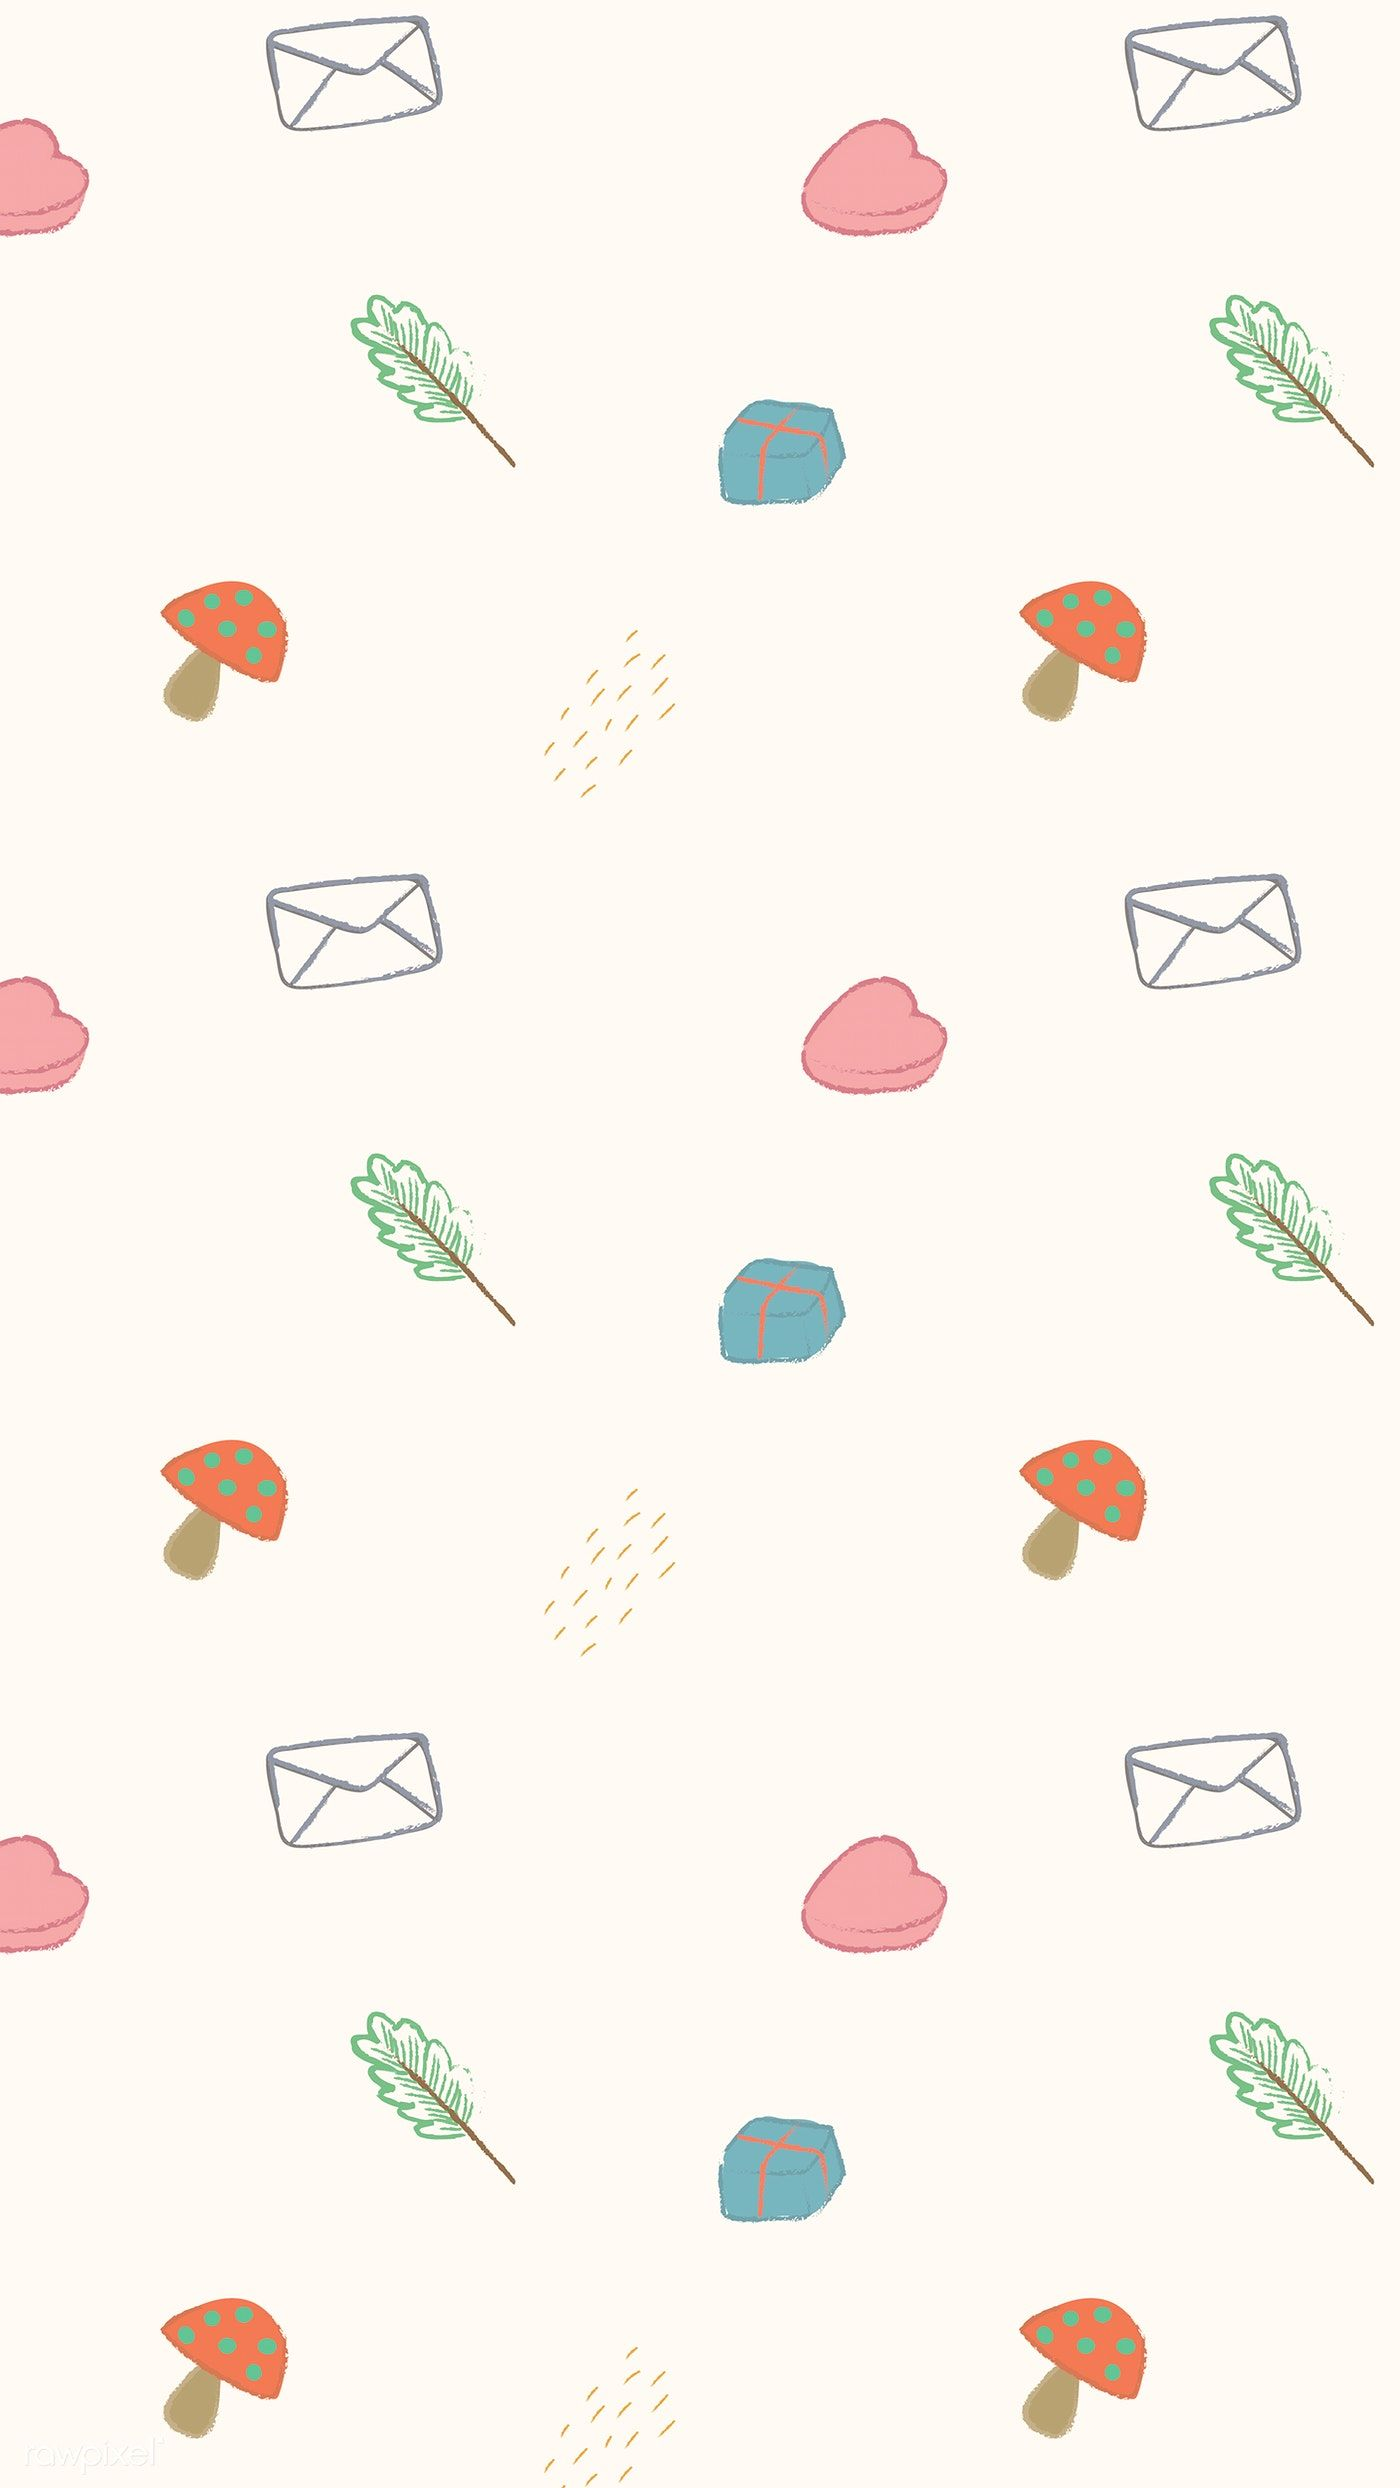 Download Premium Vector Of Cute Autumn Doodle Patterned Mobile Screen Doodle Patterns Wallpaper Iphone Cute Handphone Wallpaper